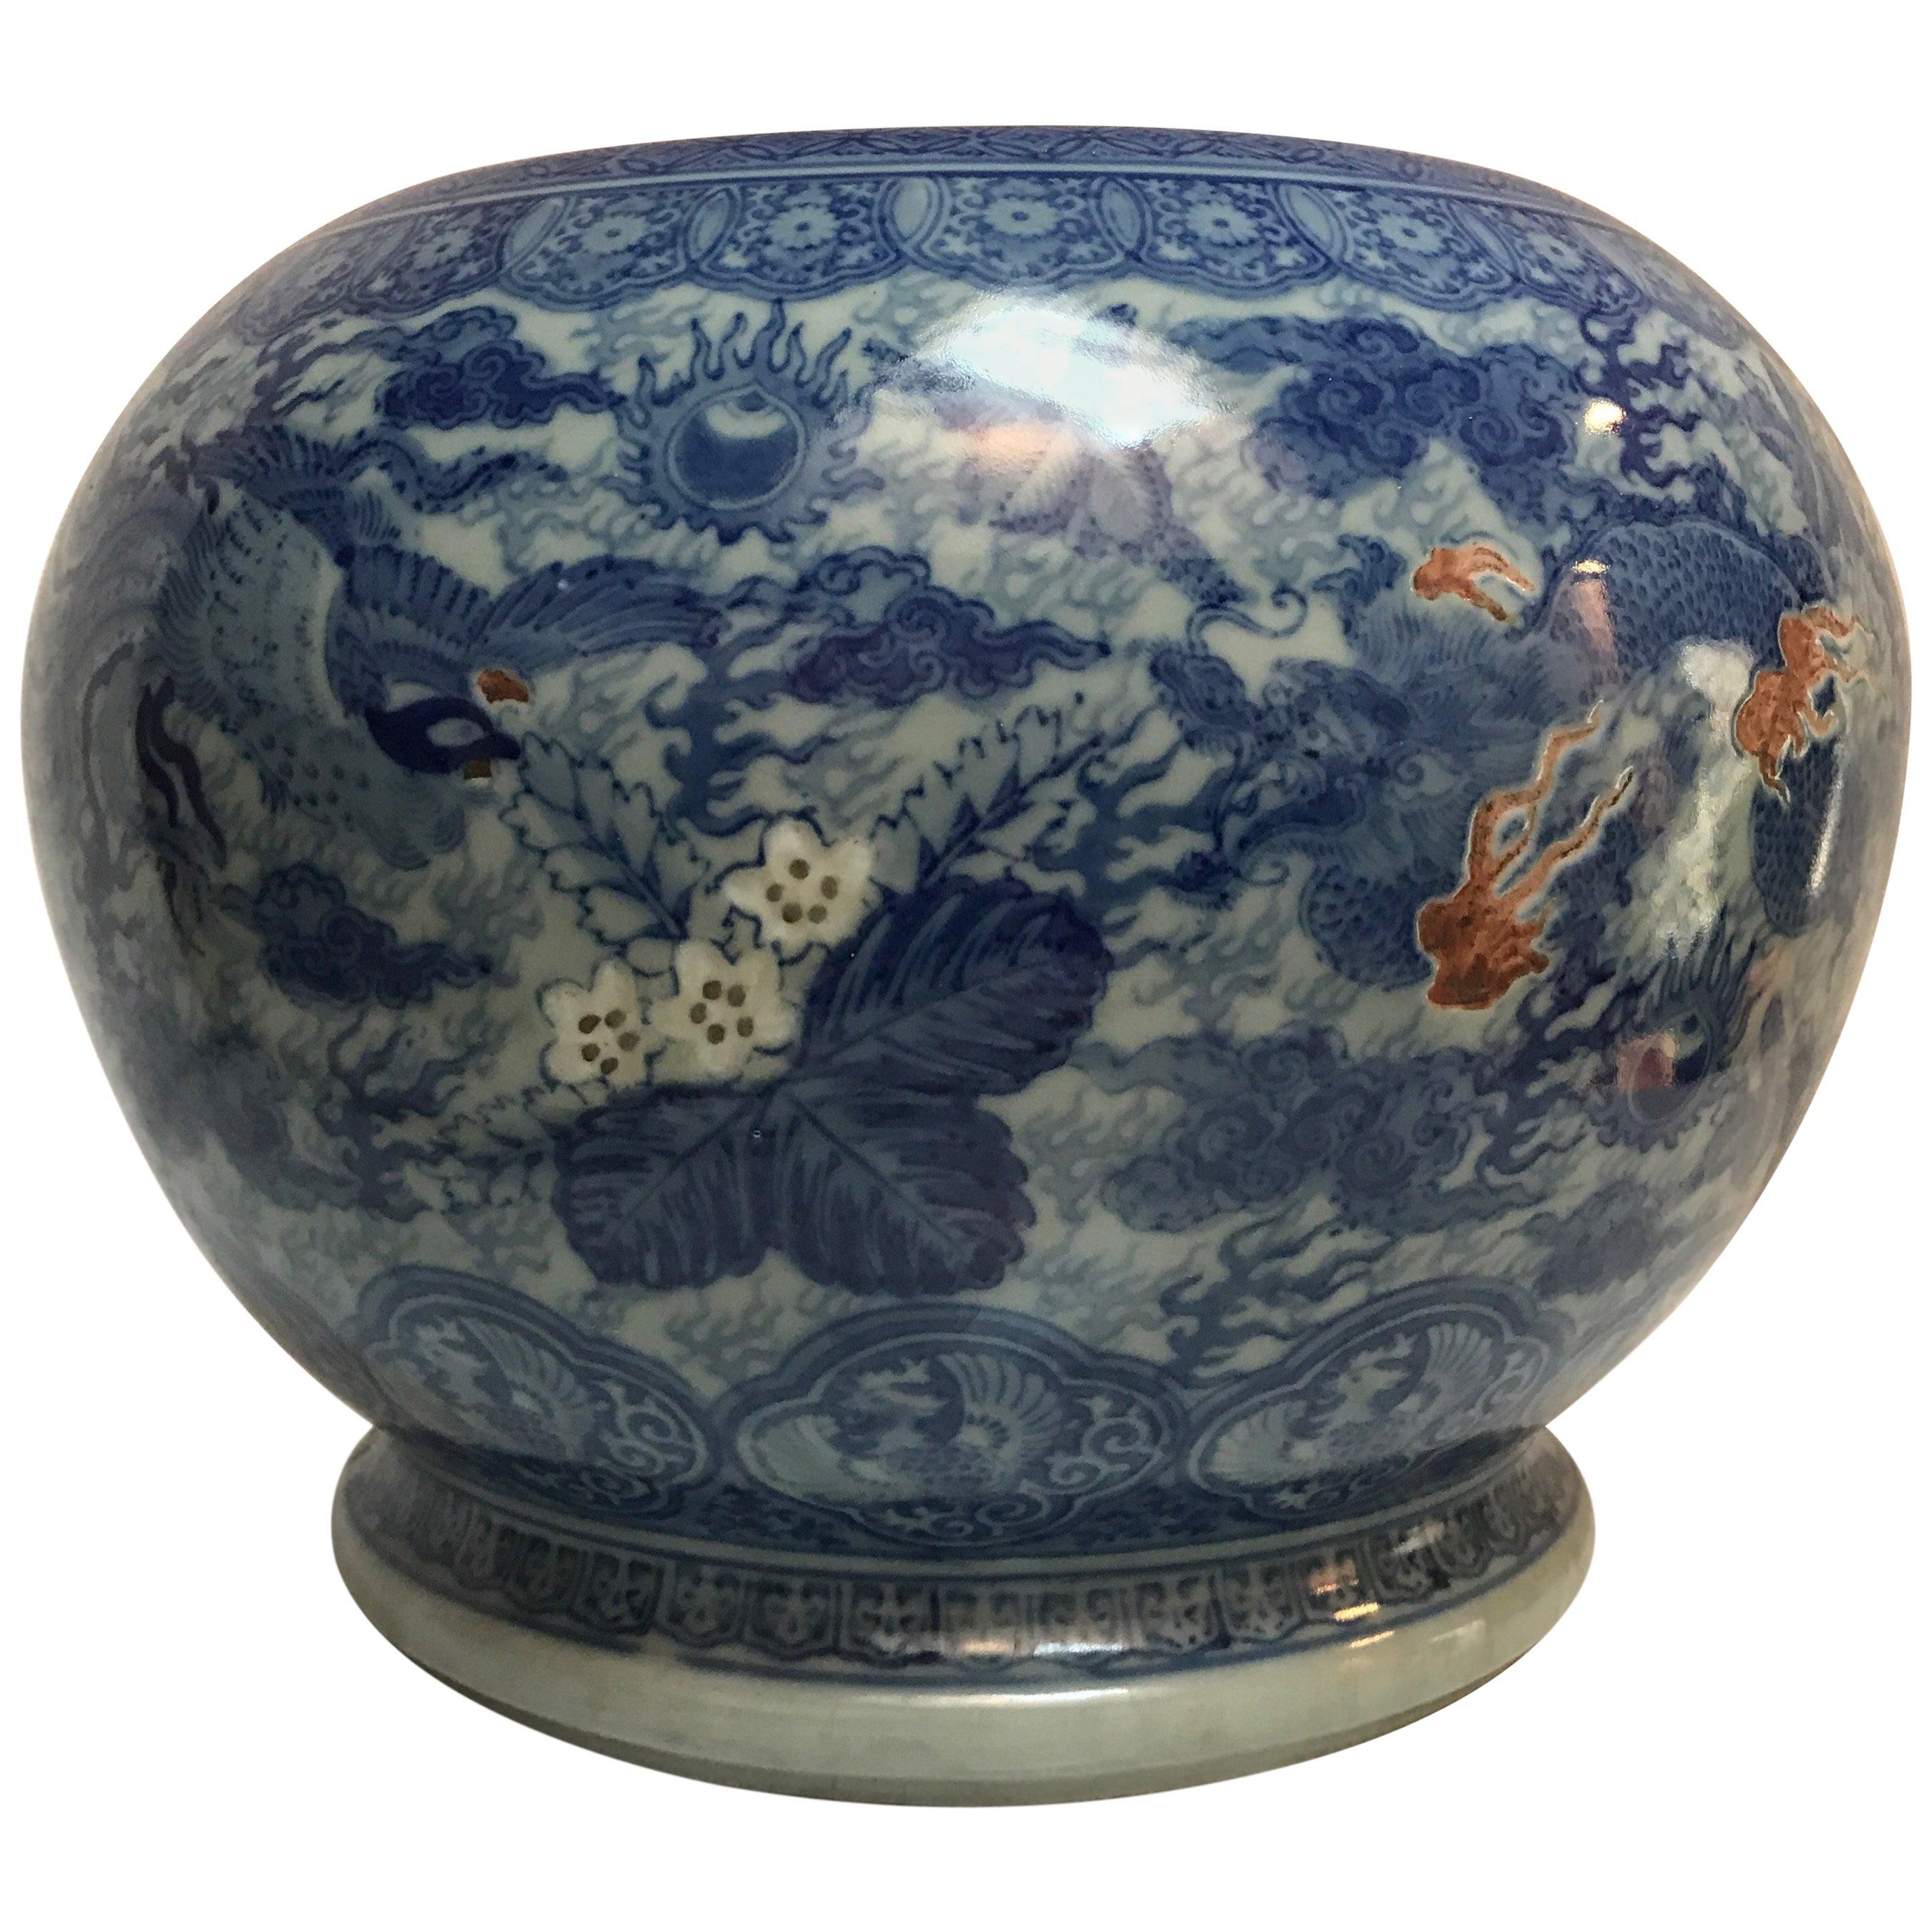 Japanese Blue and White Ceramic Fishbowl Planter Jardinière Cachepot